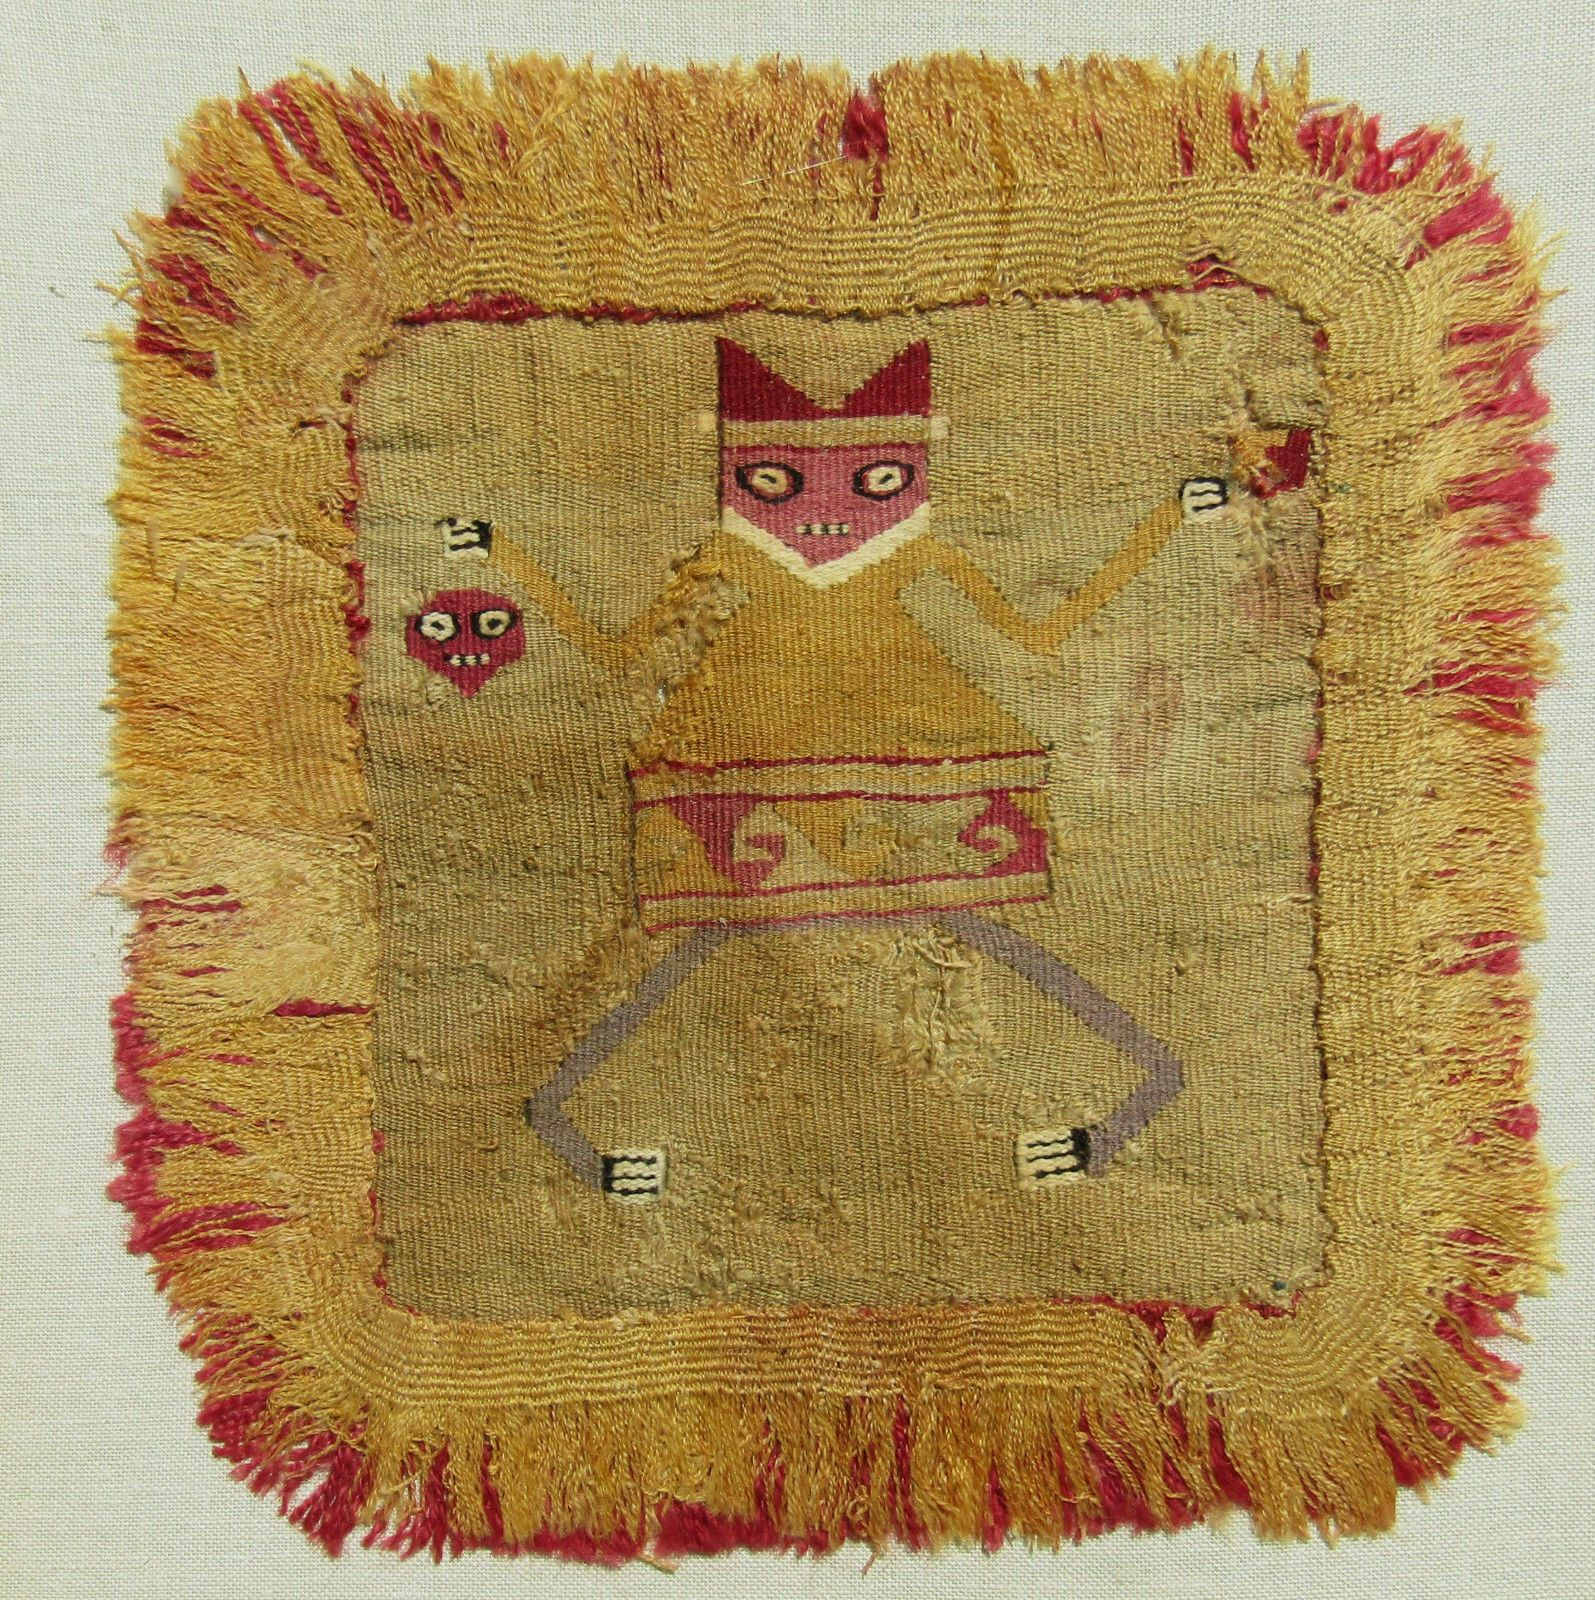 RARE MOCHE, PROTO CHIMU, TAPESTRY, 500-700 AD, PRE COLUMBIAN, BADGE OR HEADDRESS | eBay